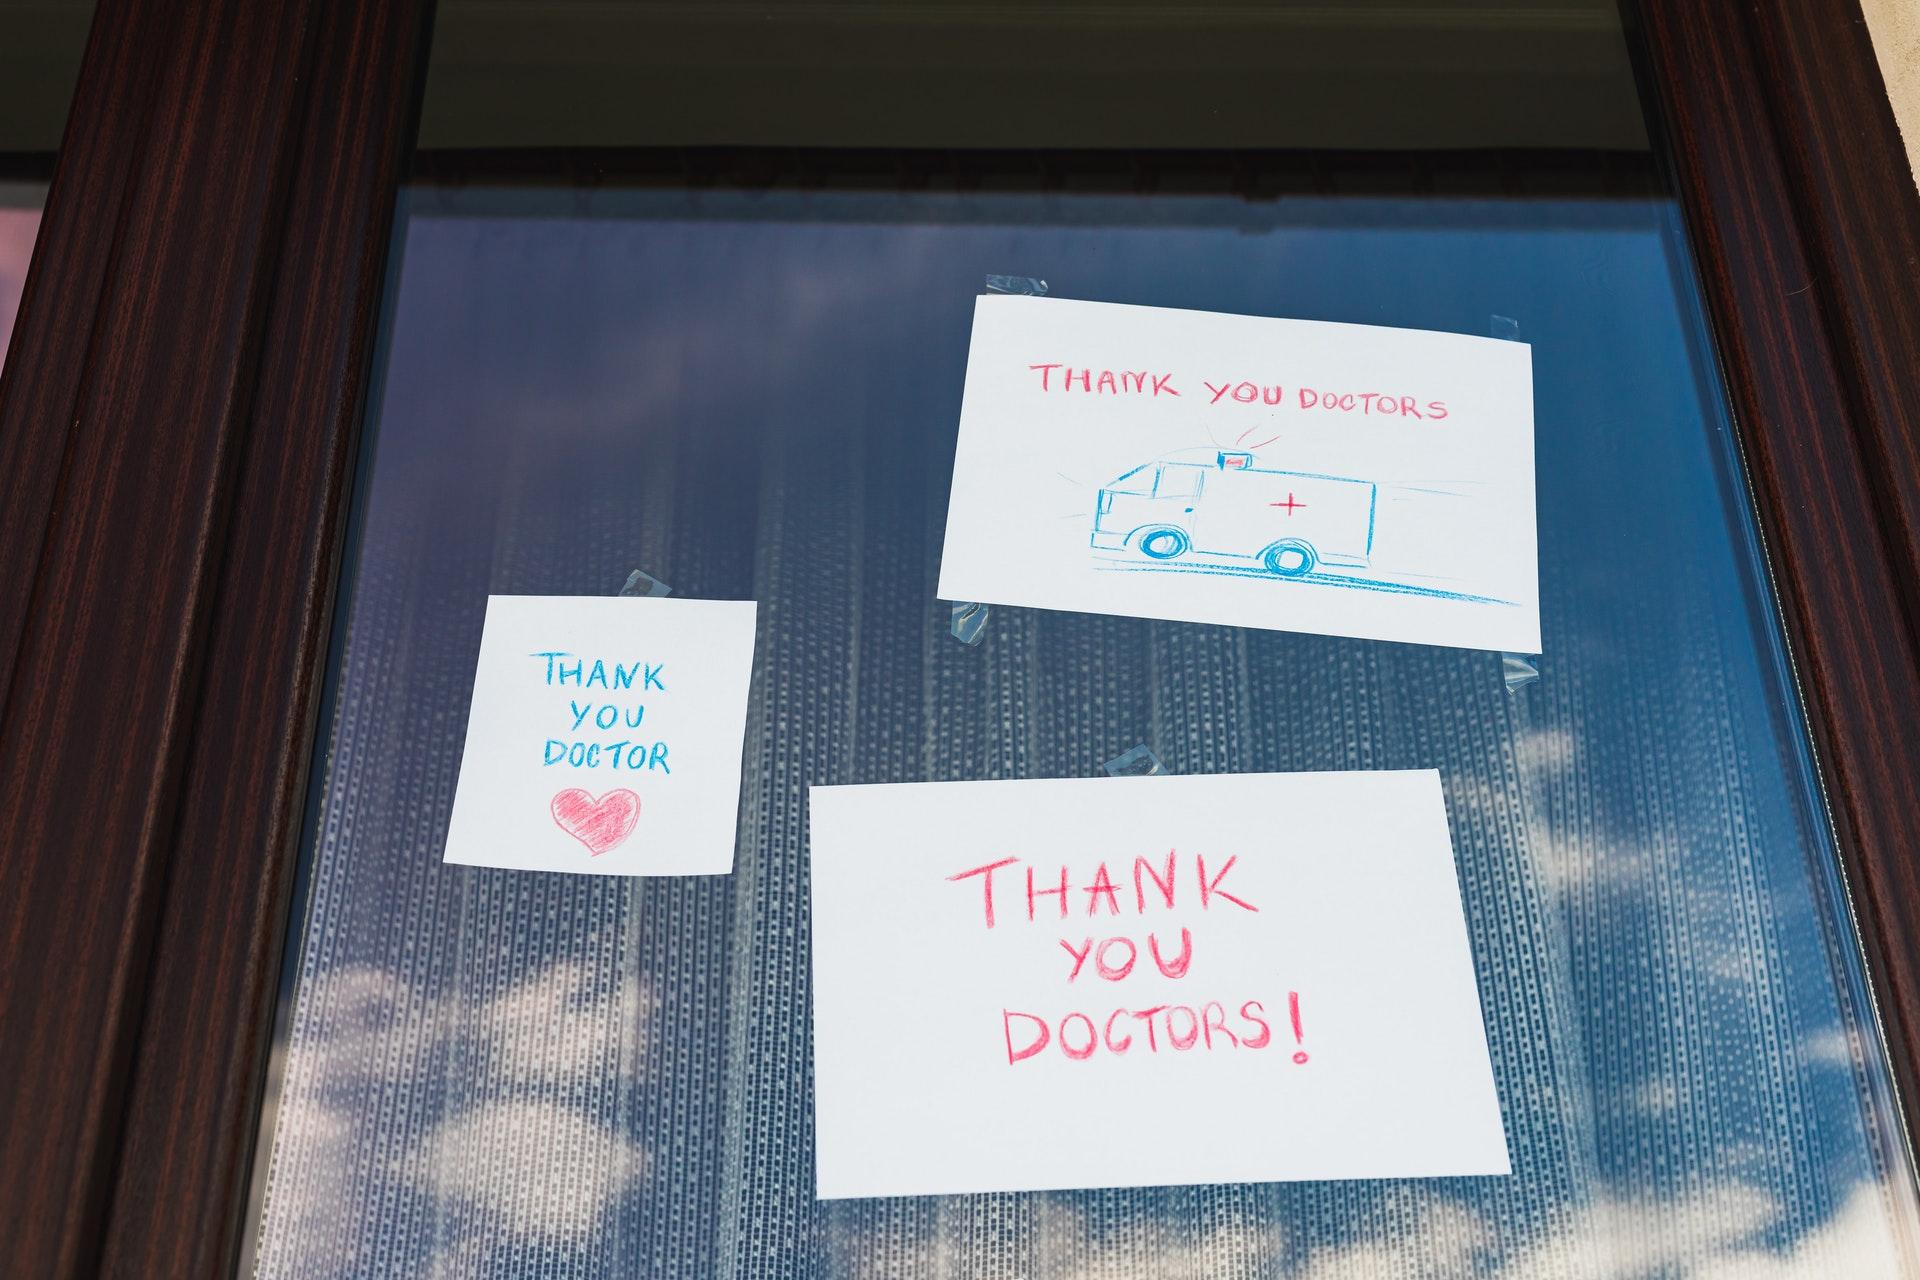 thanking doctors and nurses window thanks